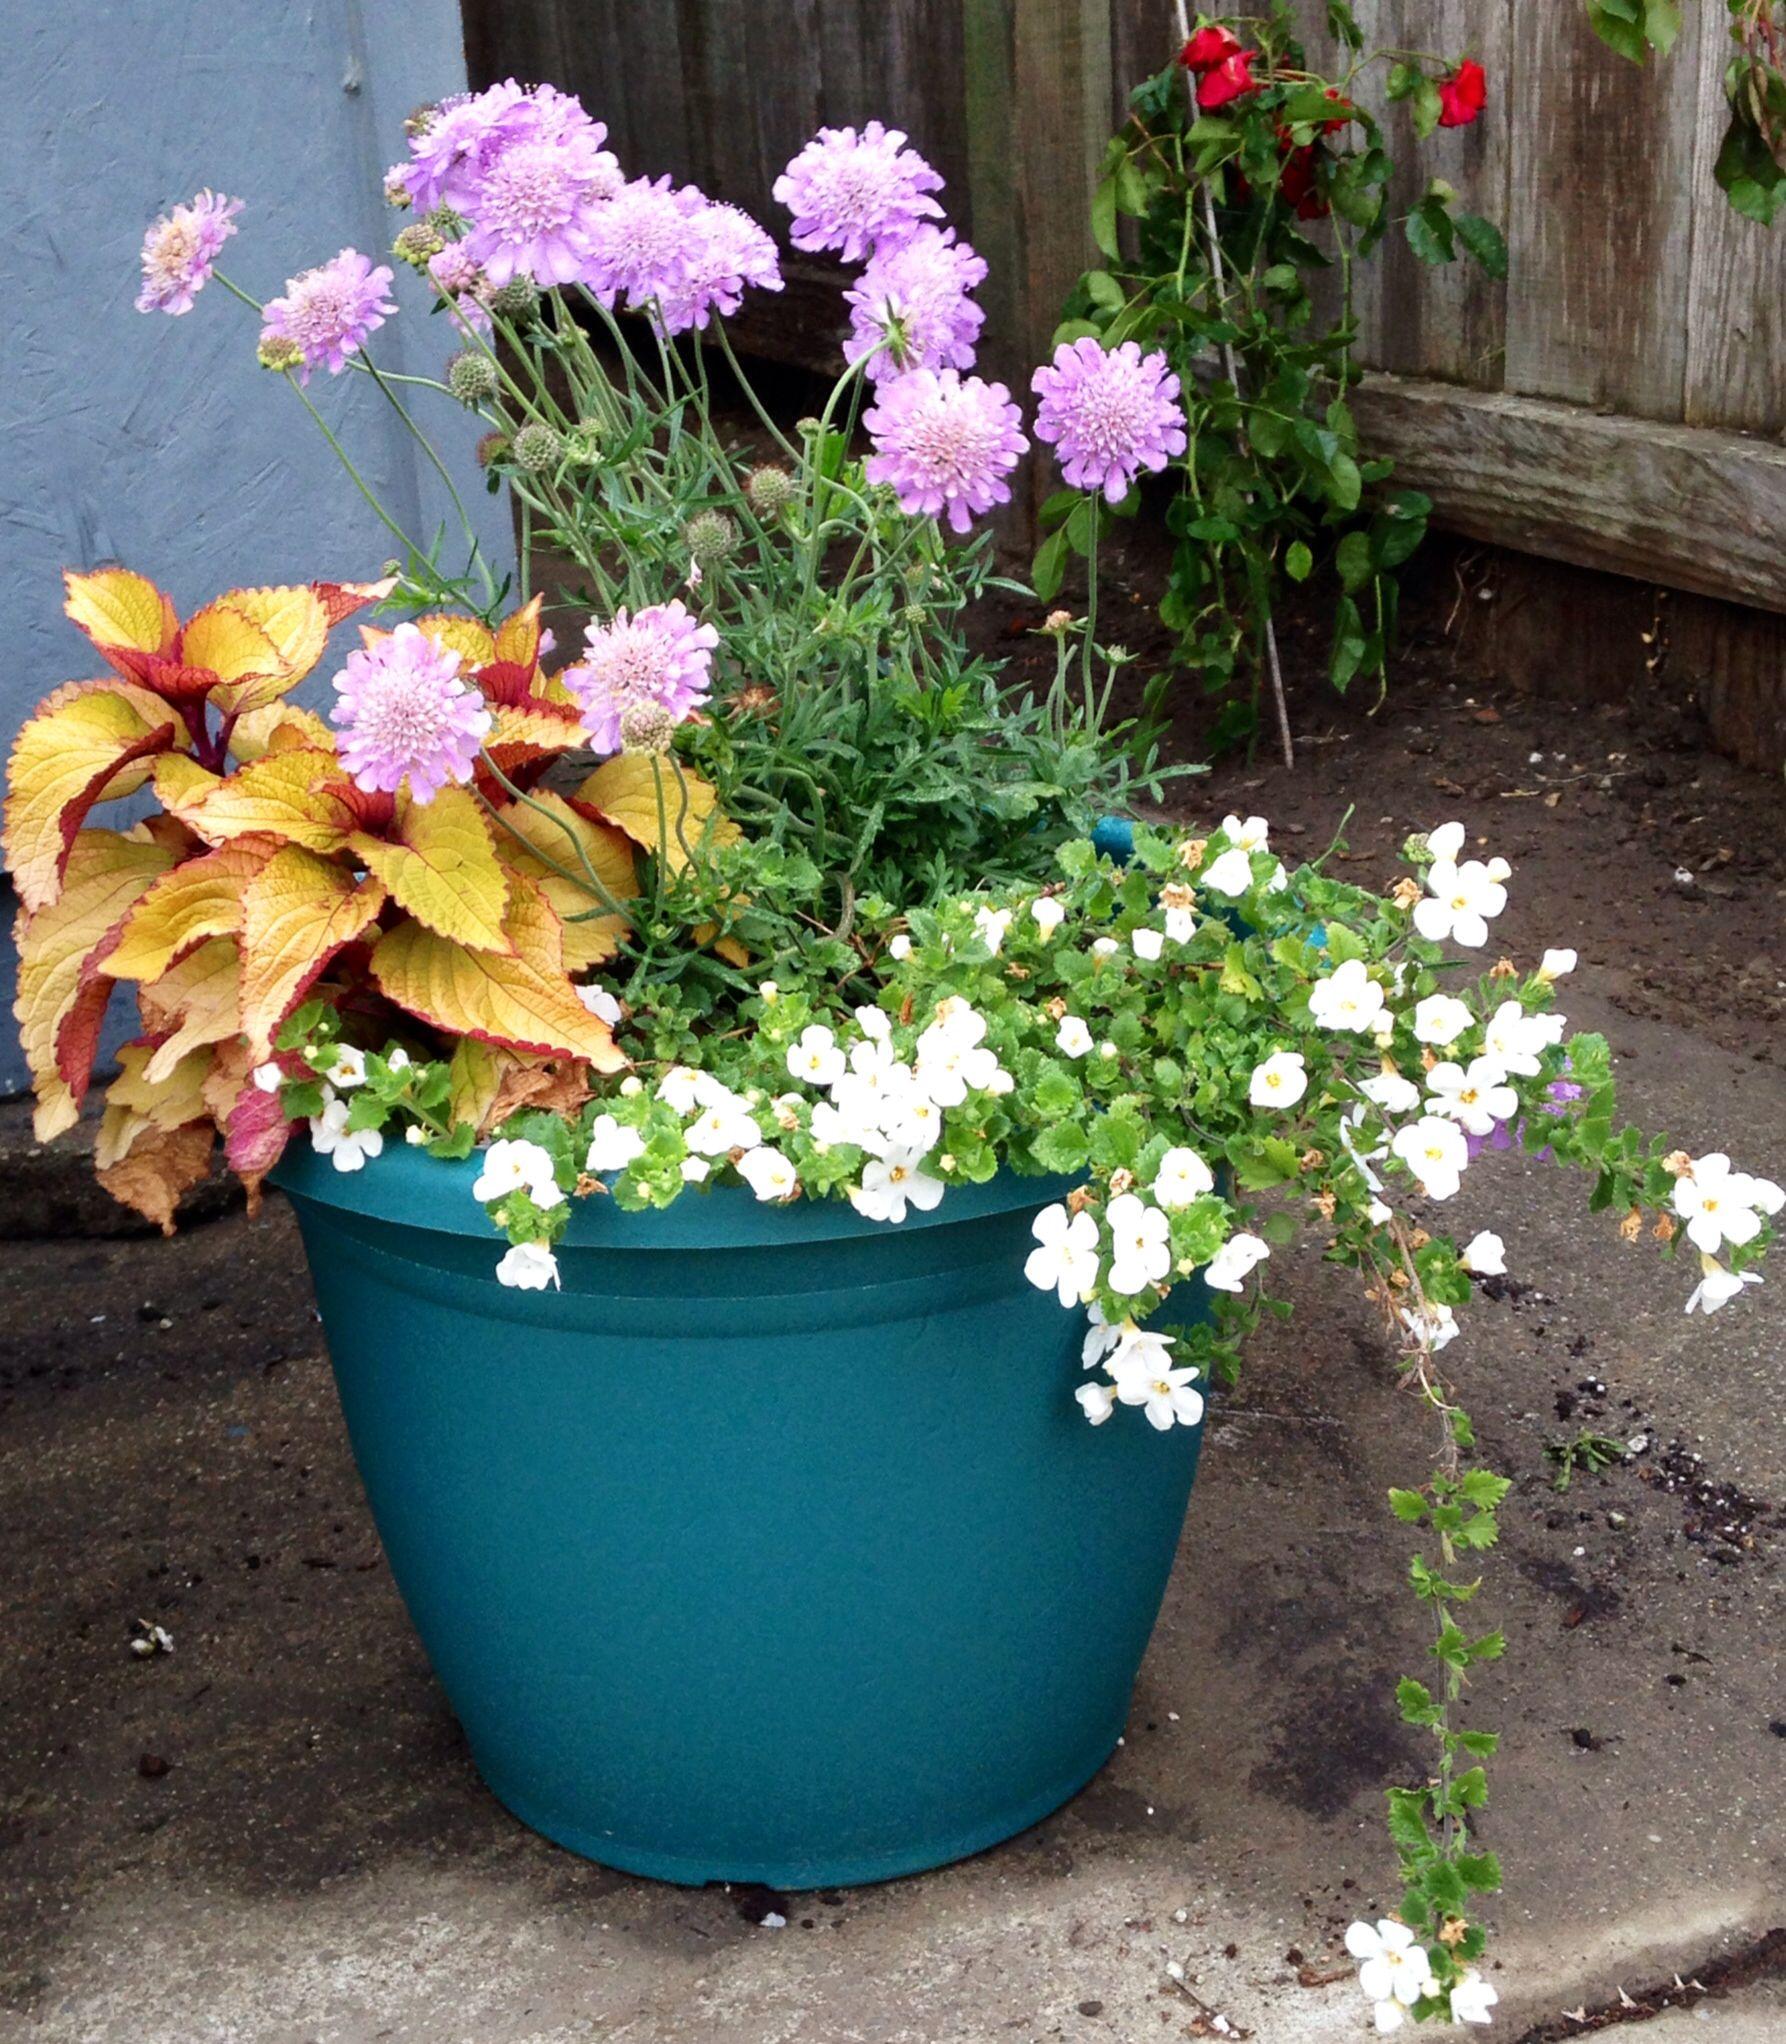 Susan's Garden - flowers - container garden Susan's Flower Susan's garden, succulents, hanging flowers, flower, arrangement, murphyfrog, repurpose, container gardening, colorful bloom